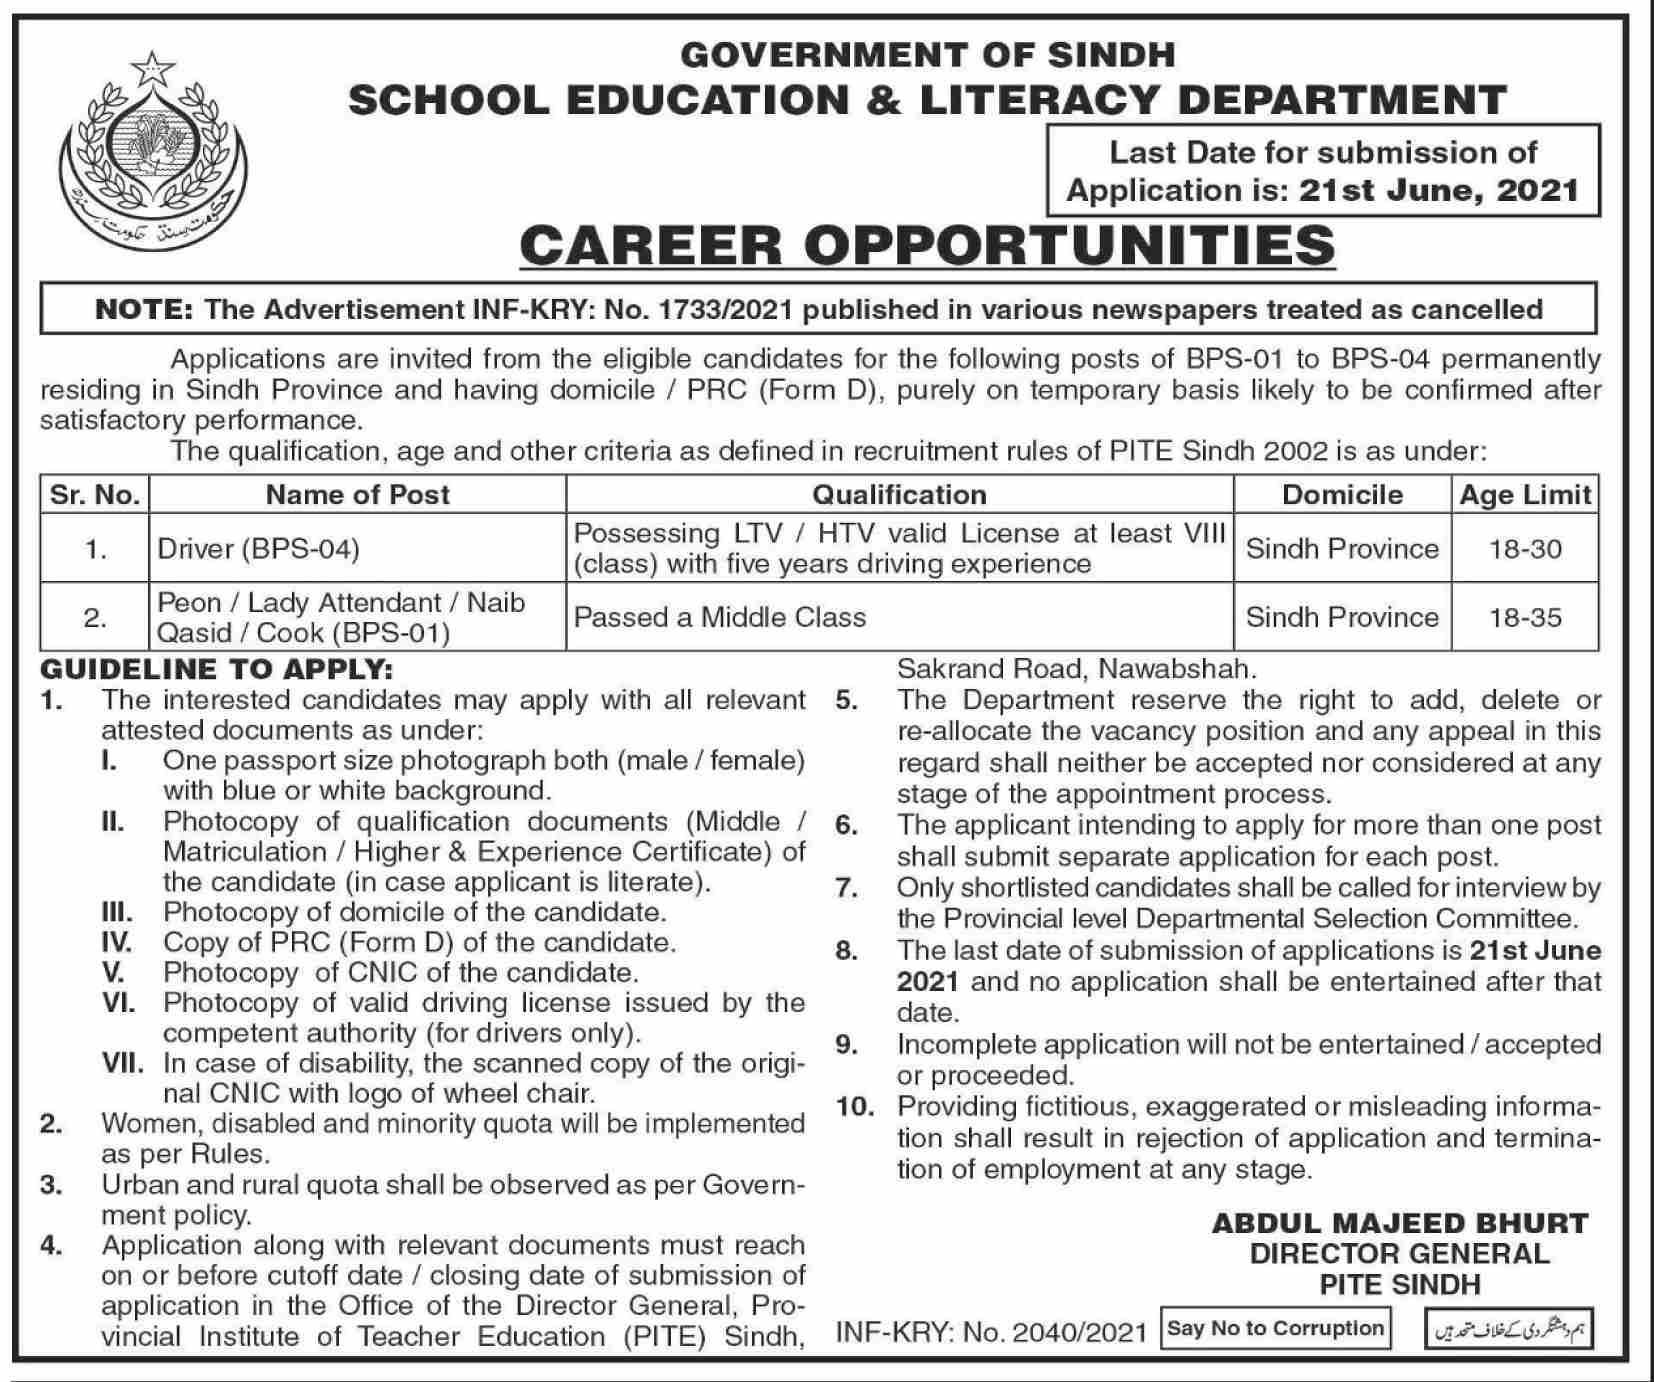 School Education and Literacy Department Jobs 2021 in Nawabshah